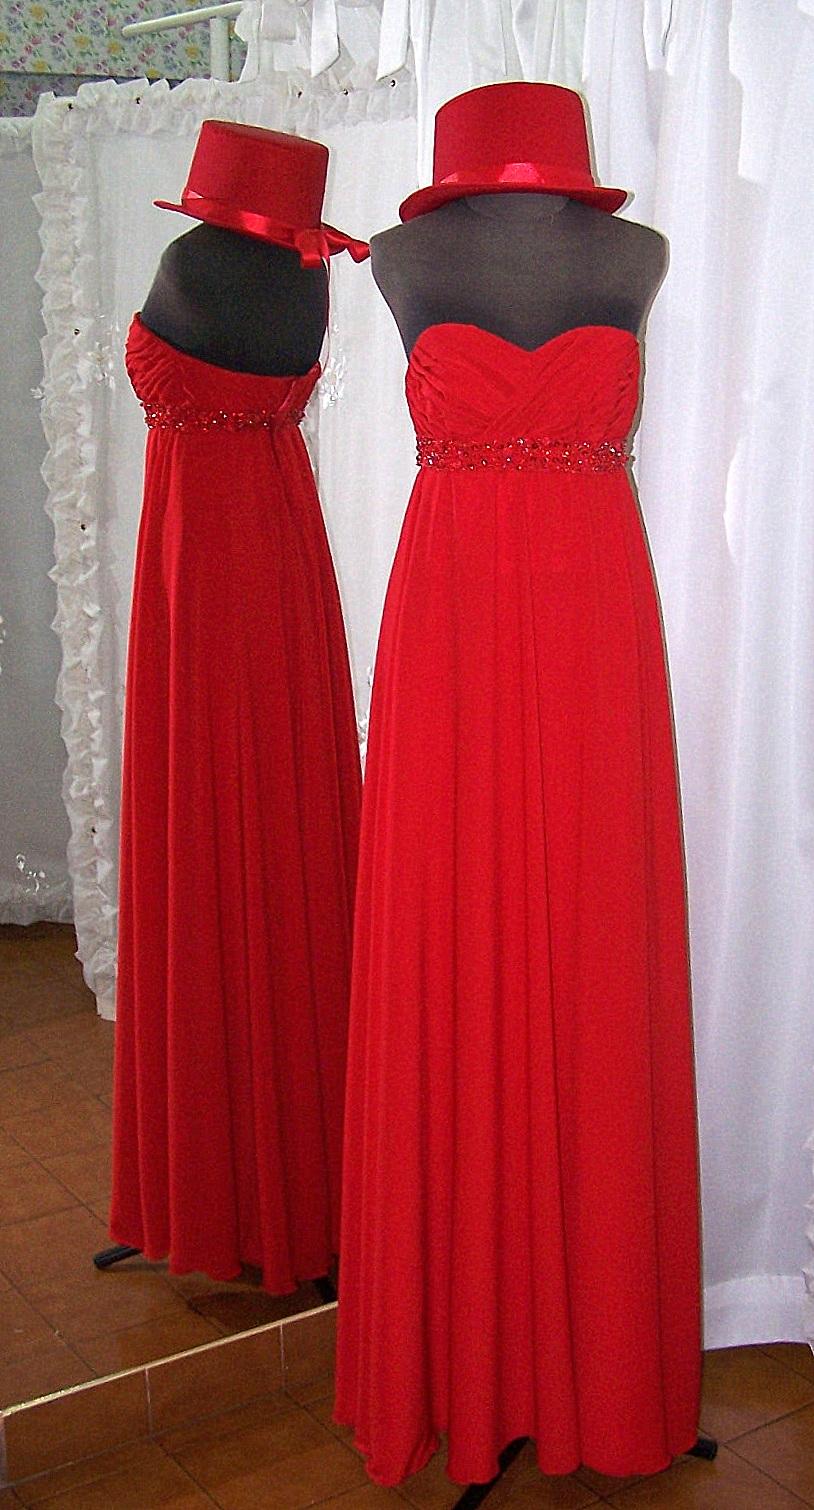 Olx posadas vestidos de fiesta